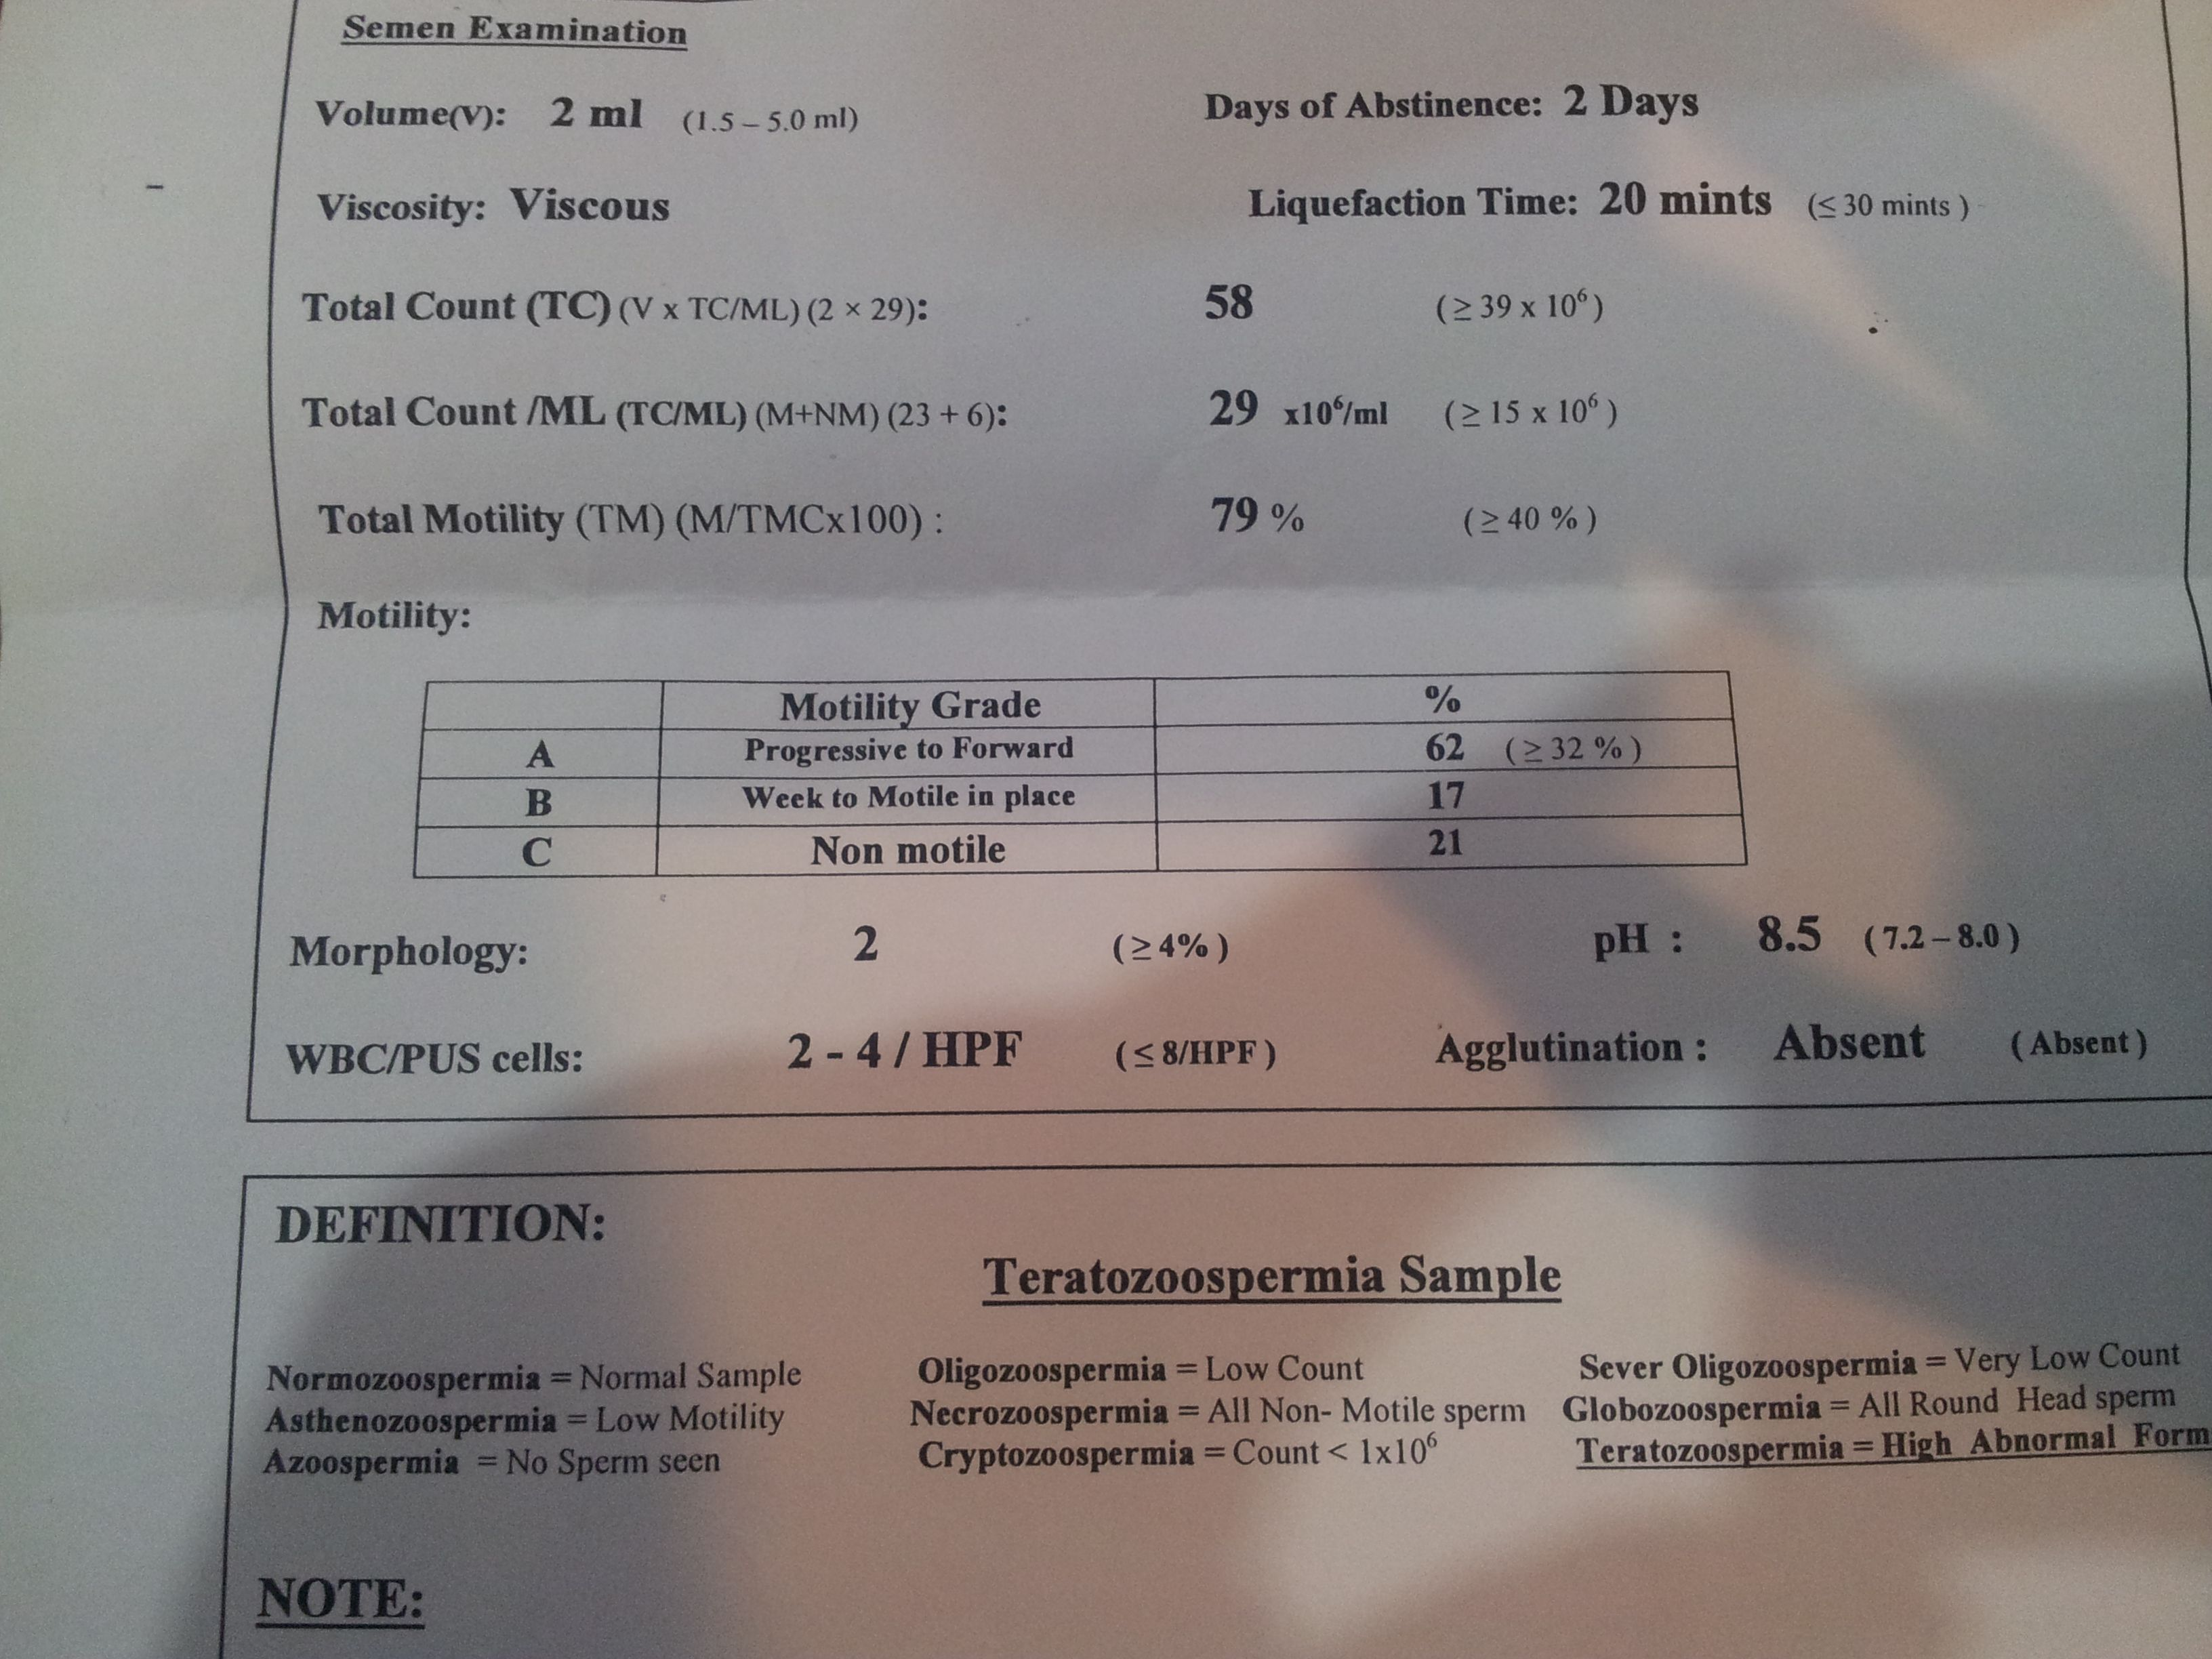 Ananiver المحرك الهجرة نتائج تحليل المنى للرجال Dsvdedommel Com